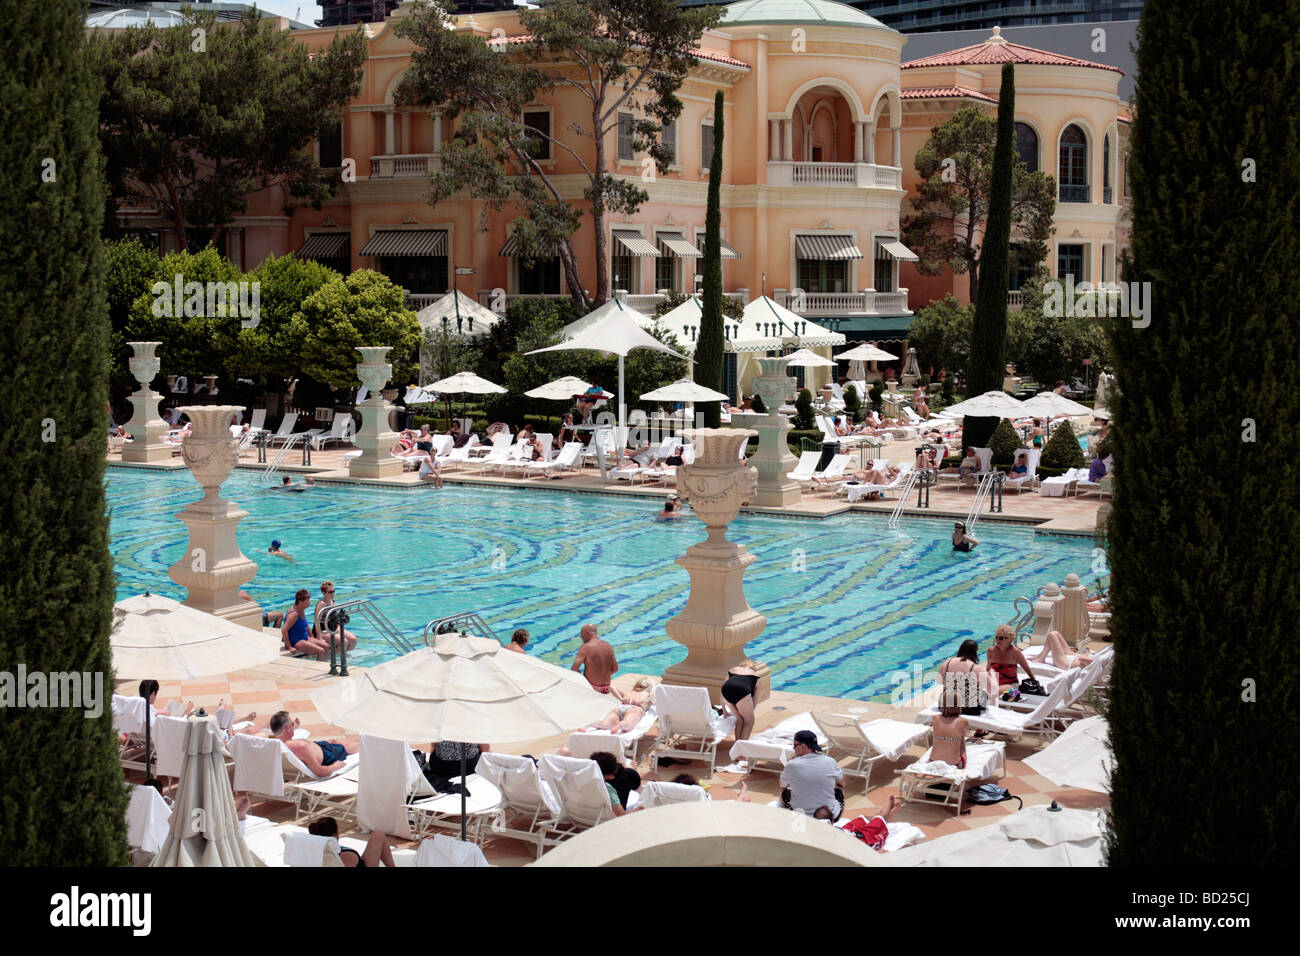 Schwimmbad Im Hotel Bellagio Las Vegas Stockfoto Bild 25249074 Alamy